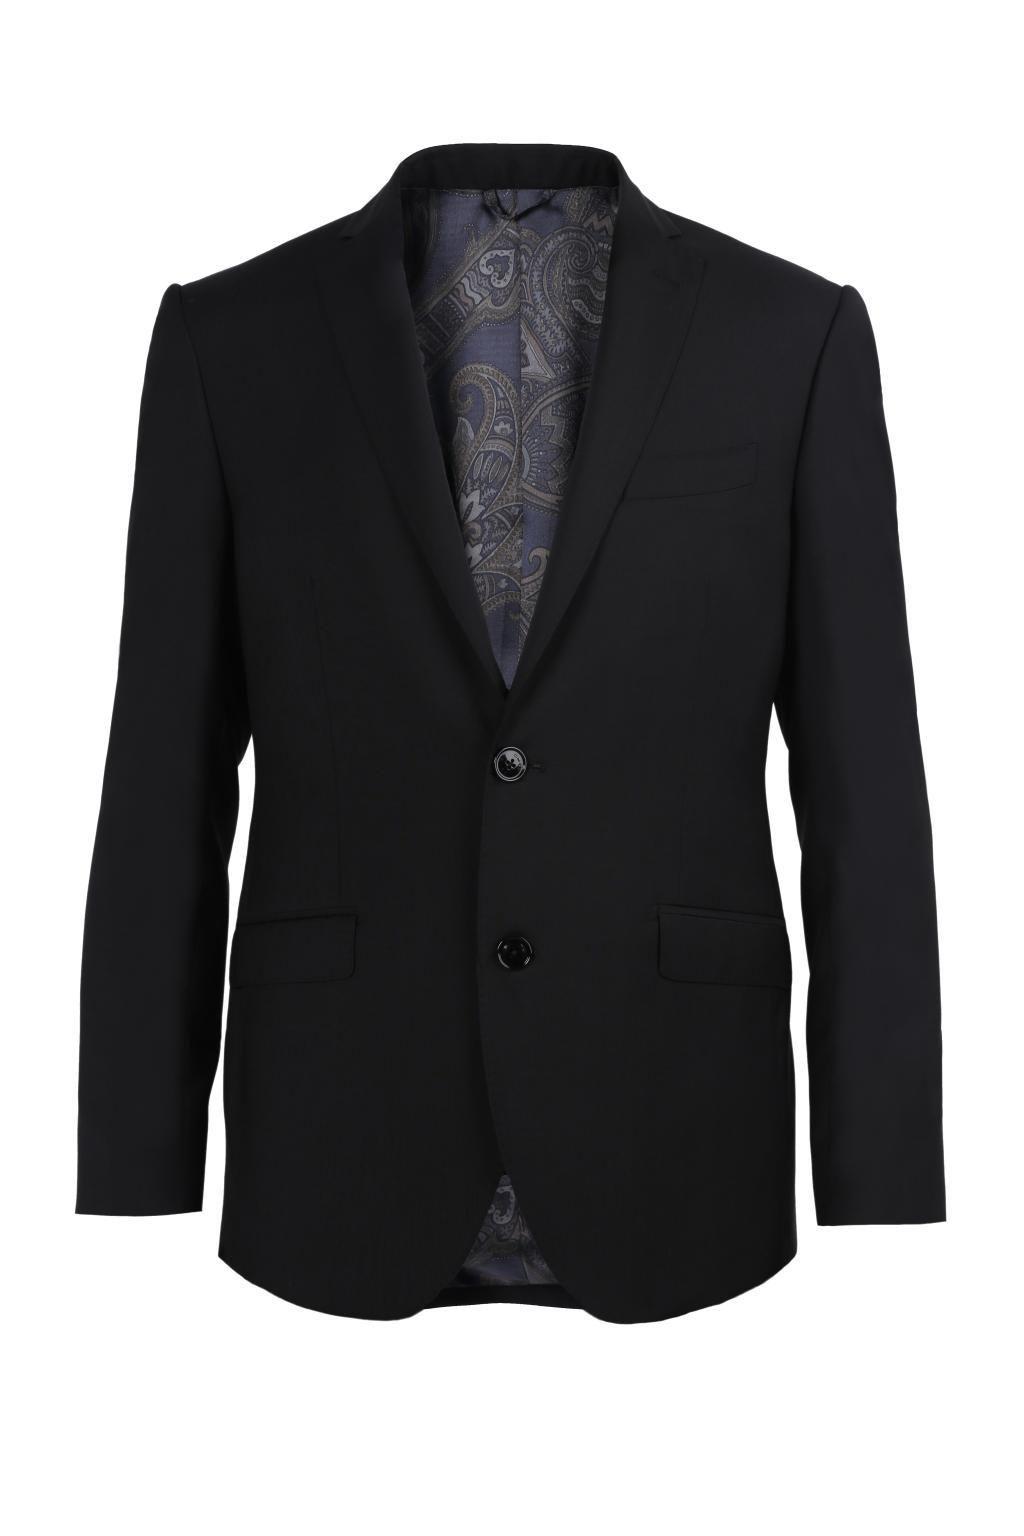 27f9940bbfcb Dolce & Gabbana three-piece dinner suit - Black in 2019   Products   Dinner  suit, Dolce, gabbana suits, Mens tuxedo suits